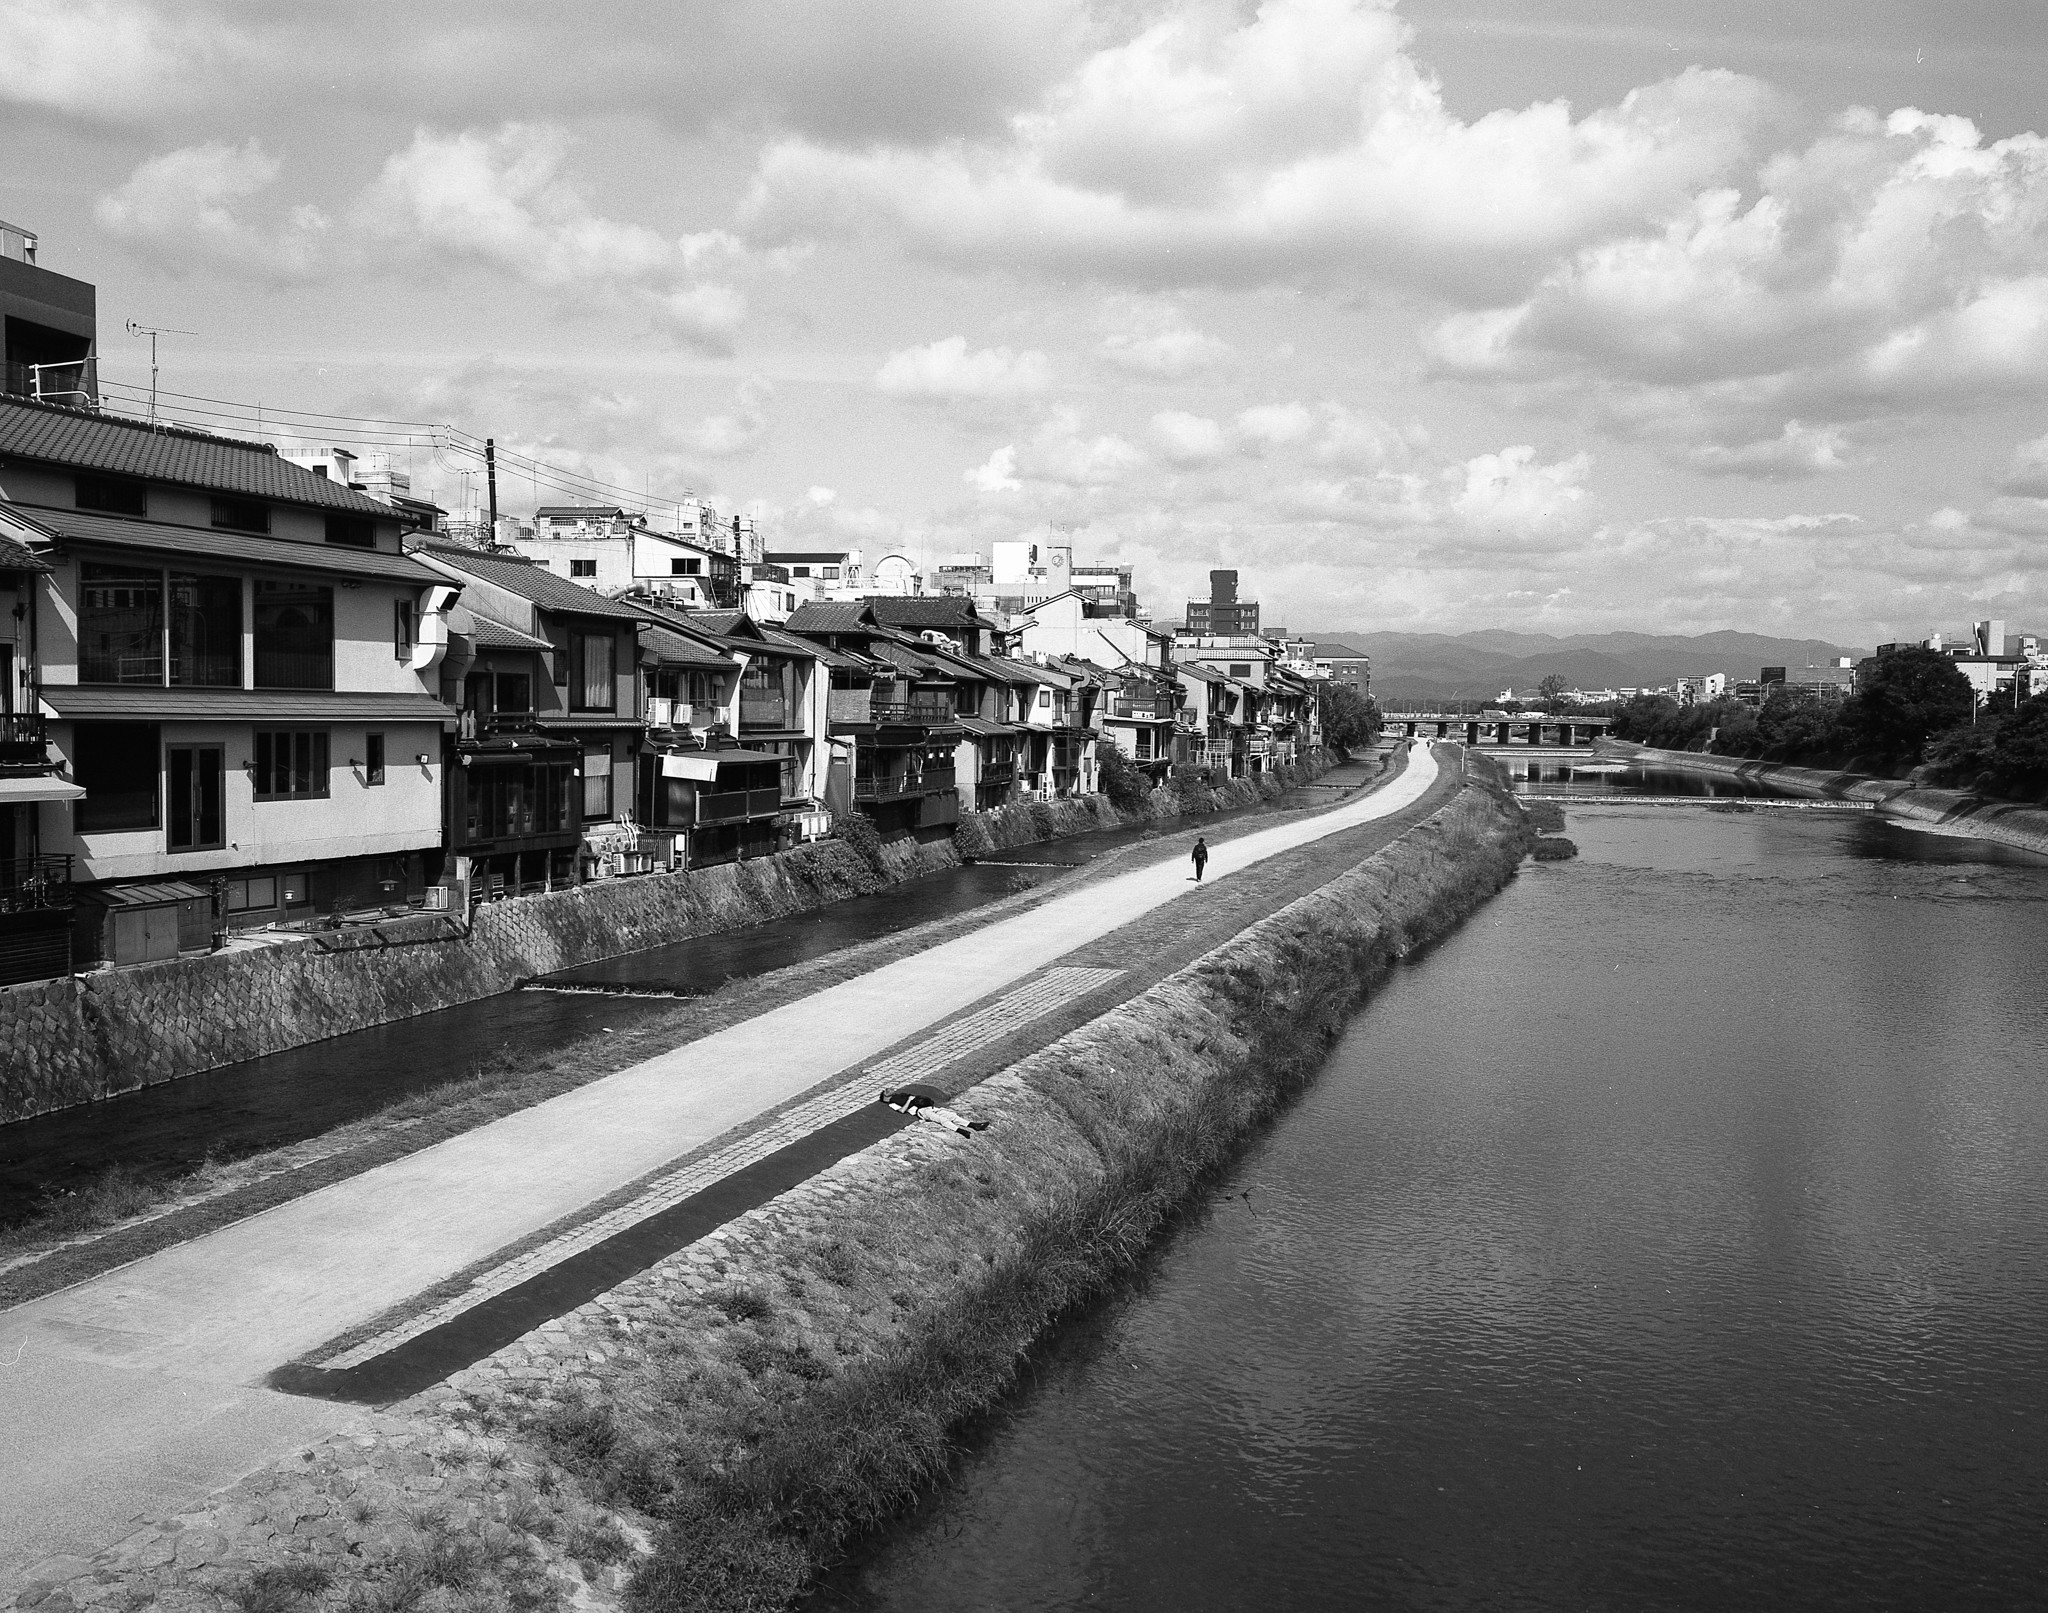 A bridge in Kyoto (Mamiya 7ii Ilford HP5+)